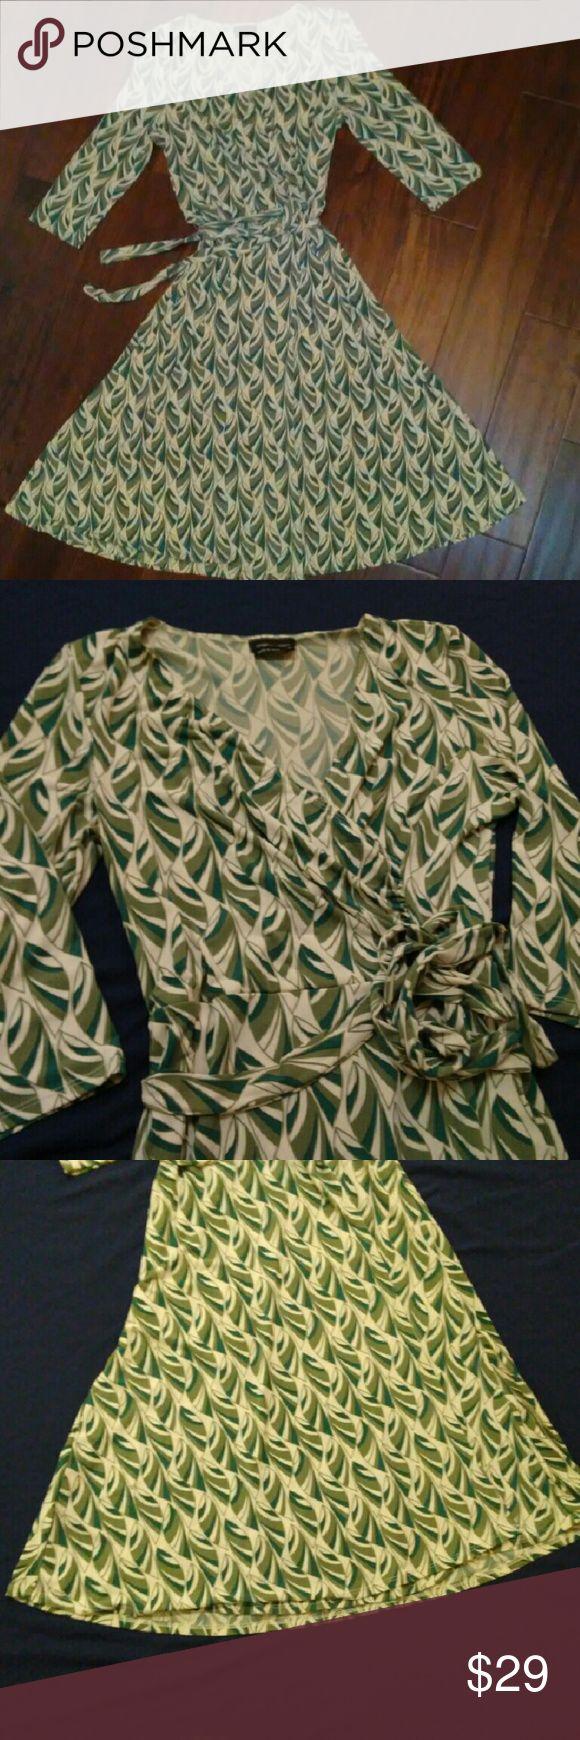 max and cleo Wrap Dress w/ leaf design sz Med max and cleo Wrap Dress w/ leaf design rouched left side cross over top sz Med Max & Cleo Dresses